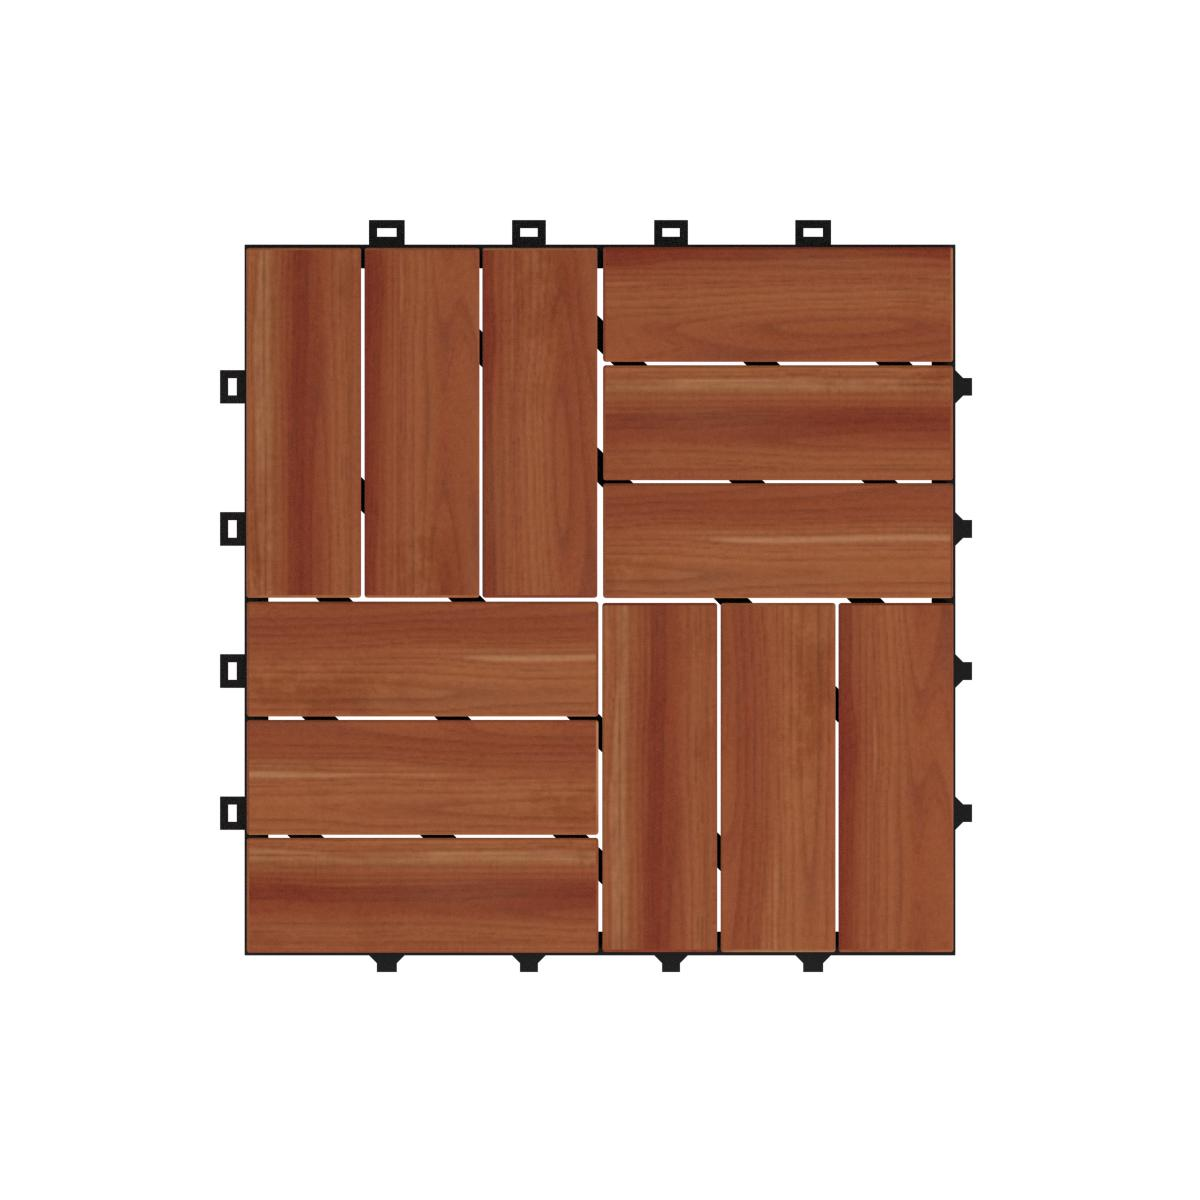 Floor decking tiles set by francescomilanese 3docean image setfloor decking tiles set 00g image setfloor decking tiles set 01g image setfloor decking tiles set 02g dailygadgetfo Gallery